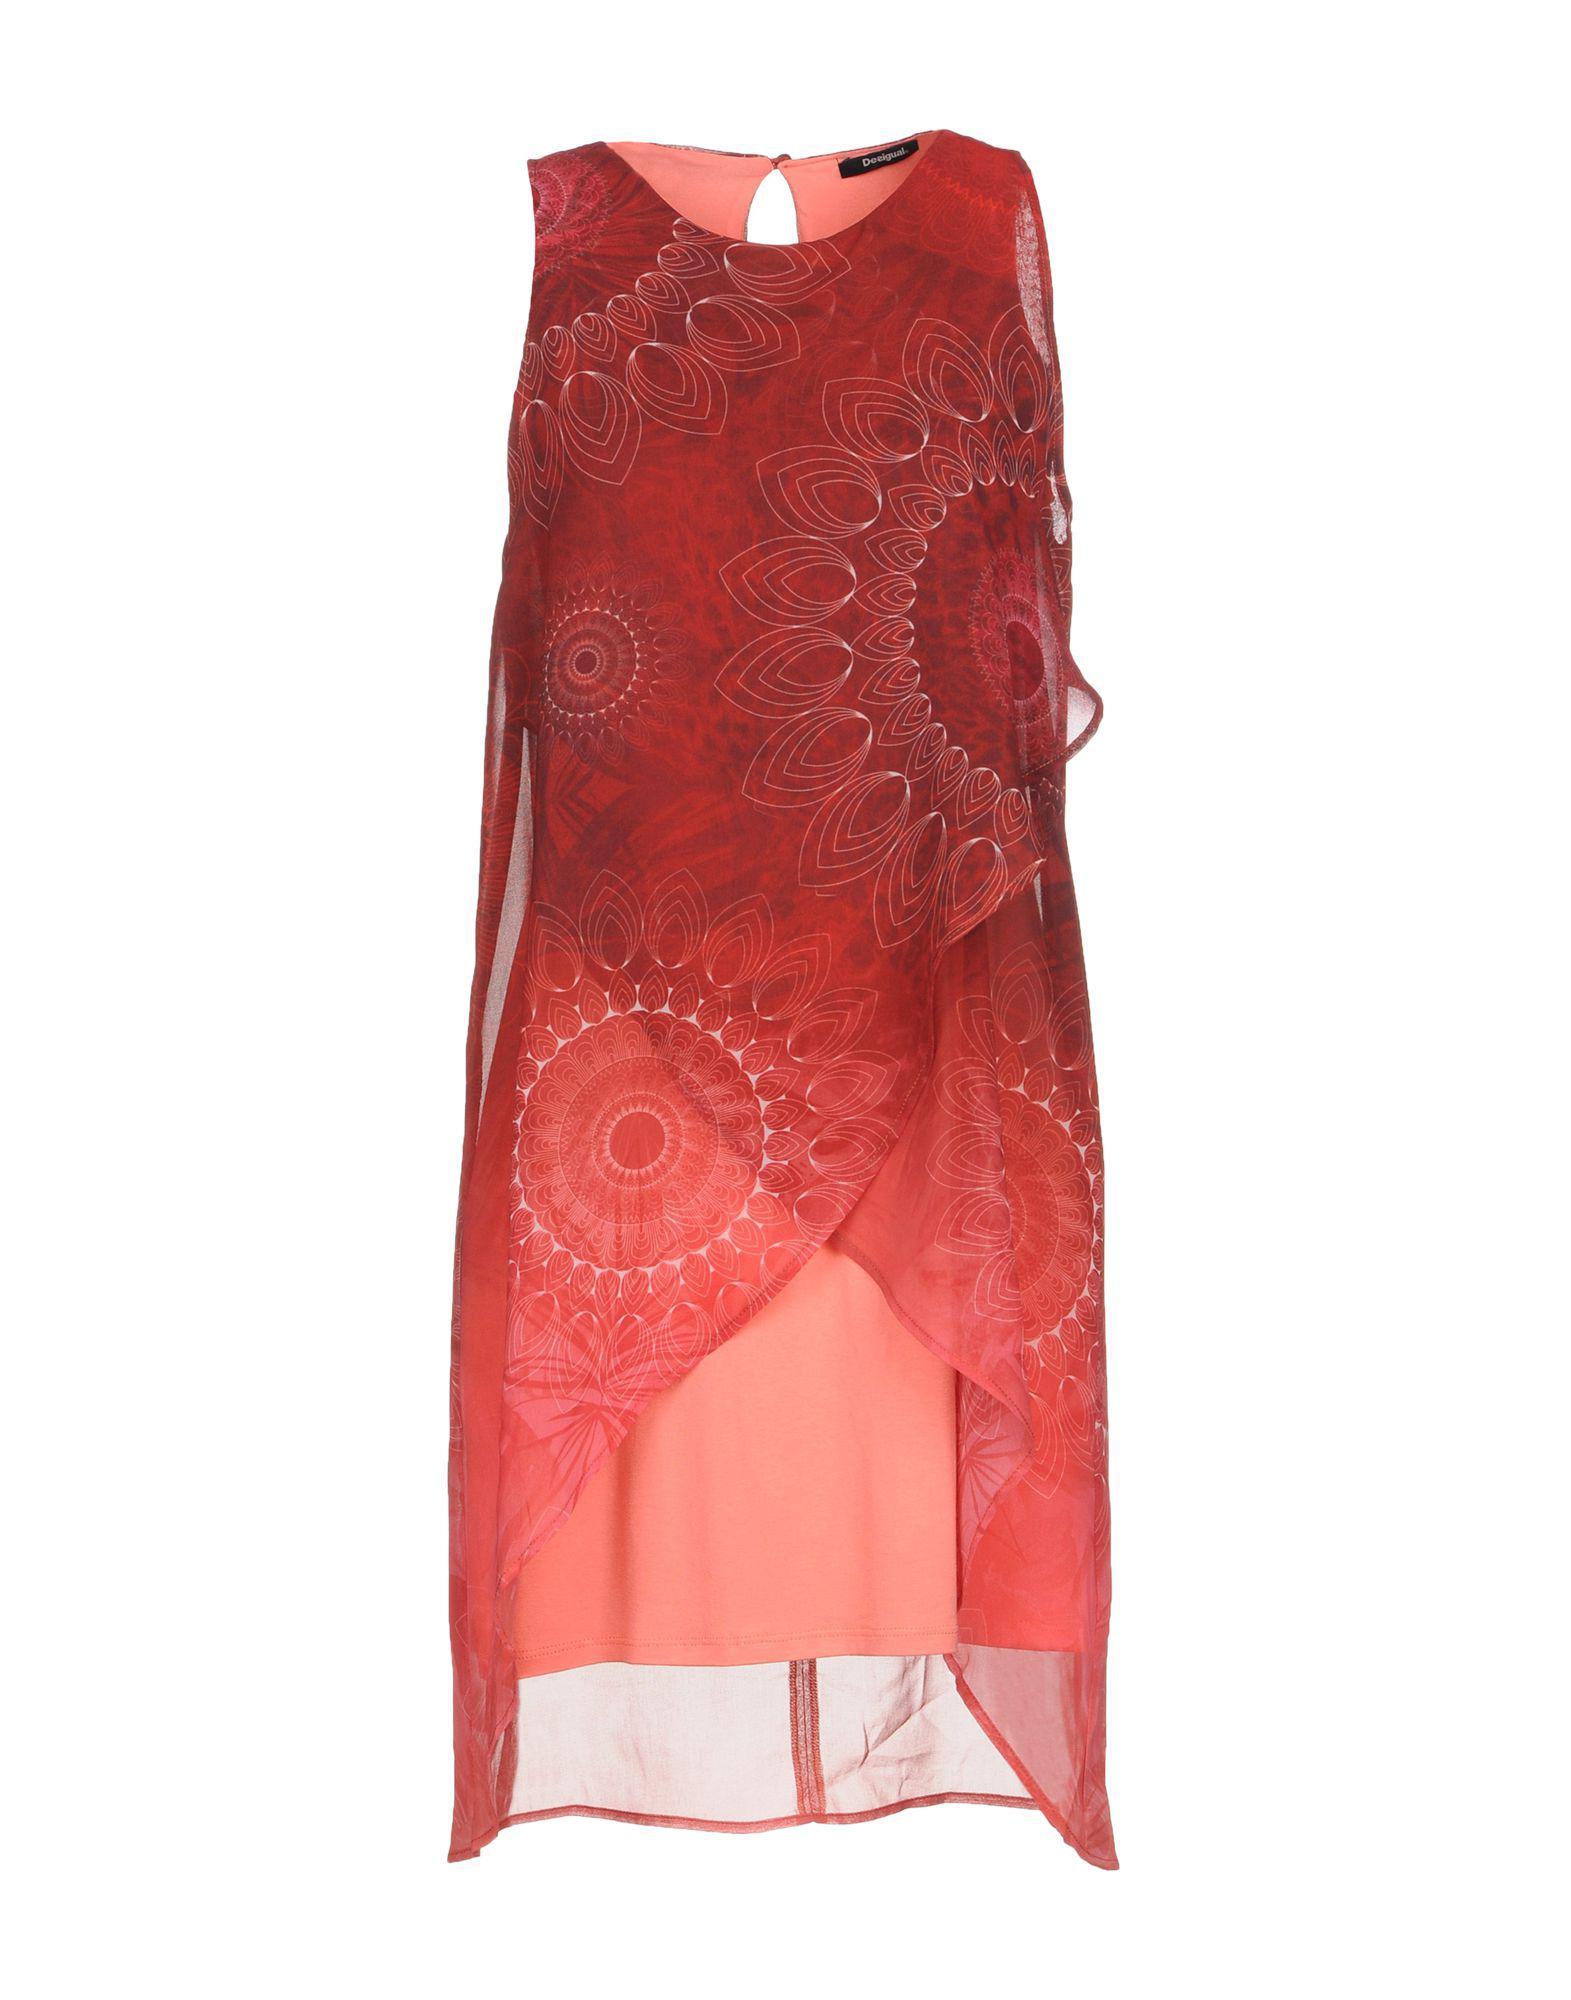 Desigual Short Dress in Red - Lyst